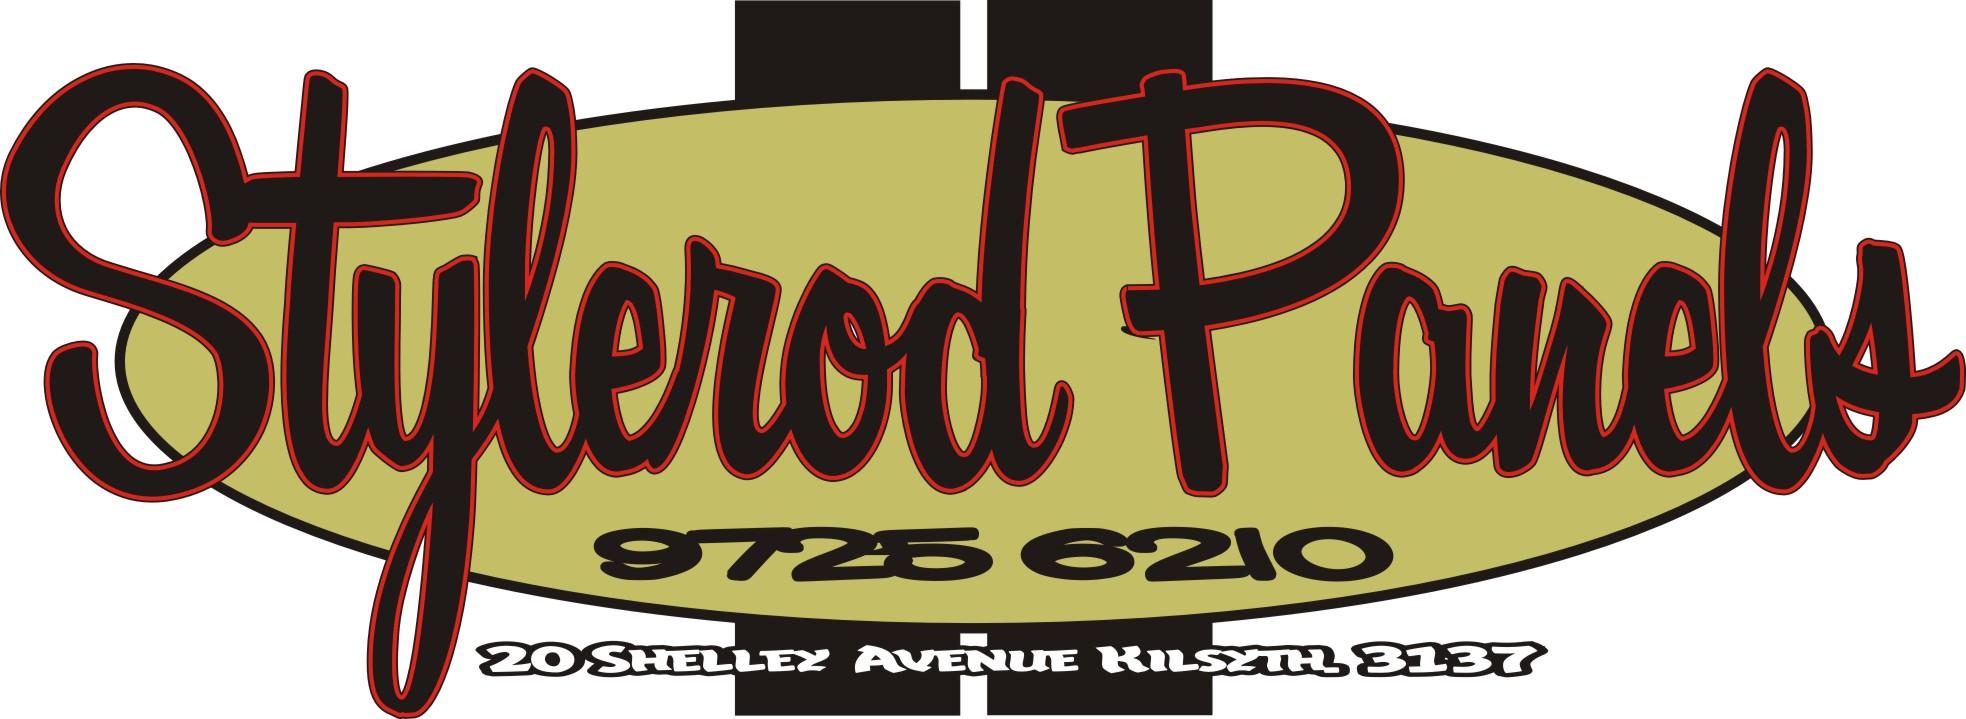 Stylerod Panels Pty Ltd 20 Shelley Ave KILSYTH  VIC  3137   Phone:  (03) 9725 6210 Fax : (03) 9723 6